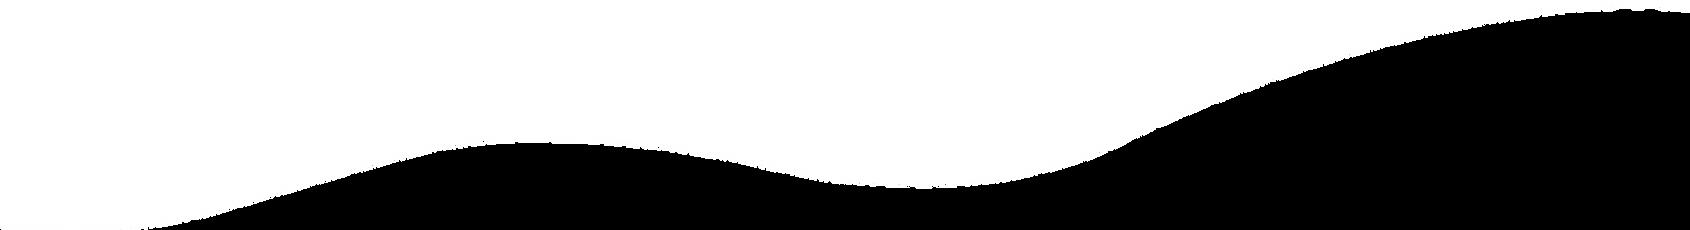 Clinika-pattern-bottom.png